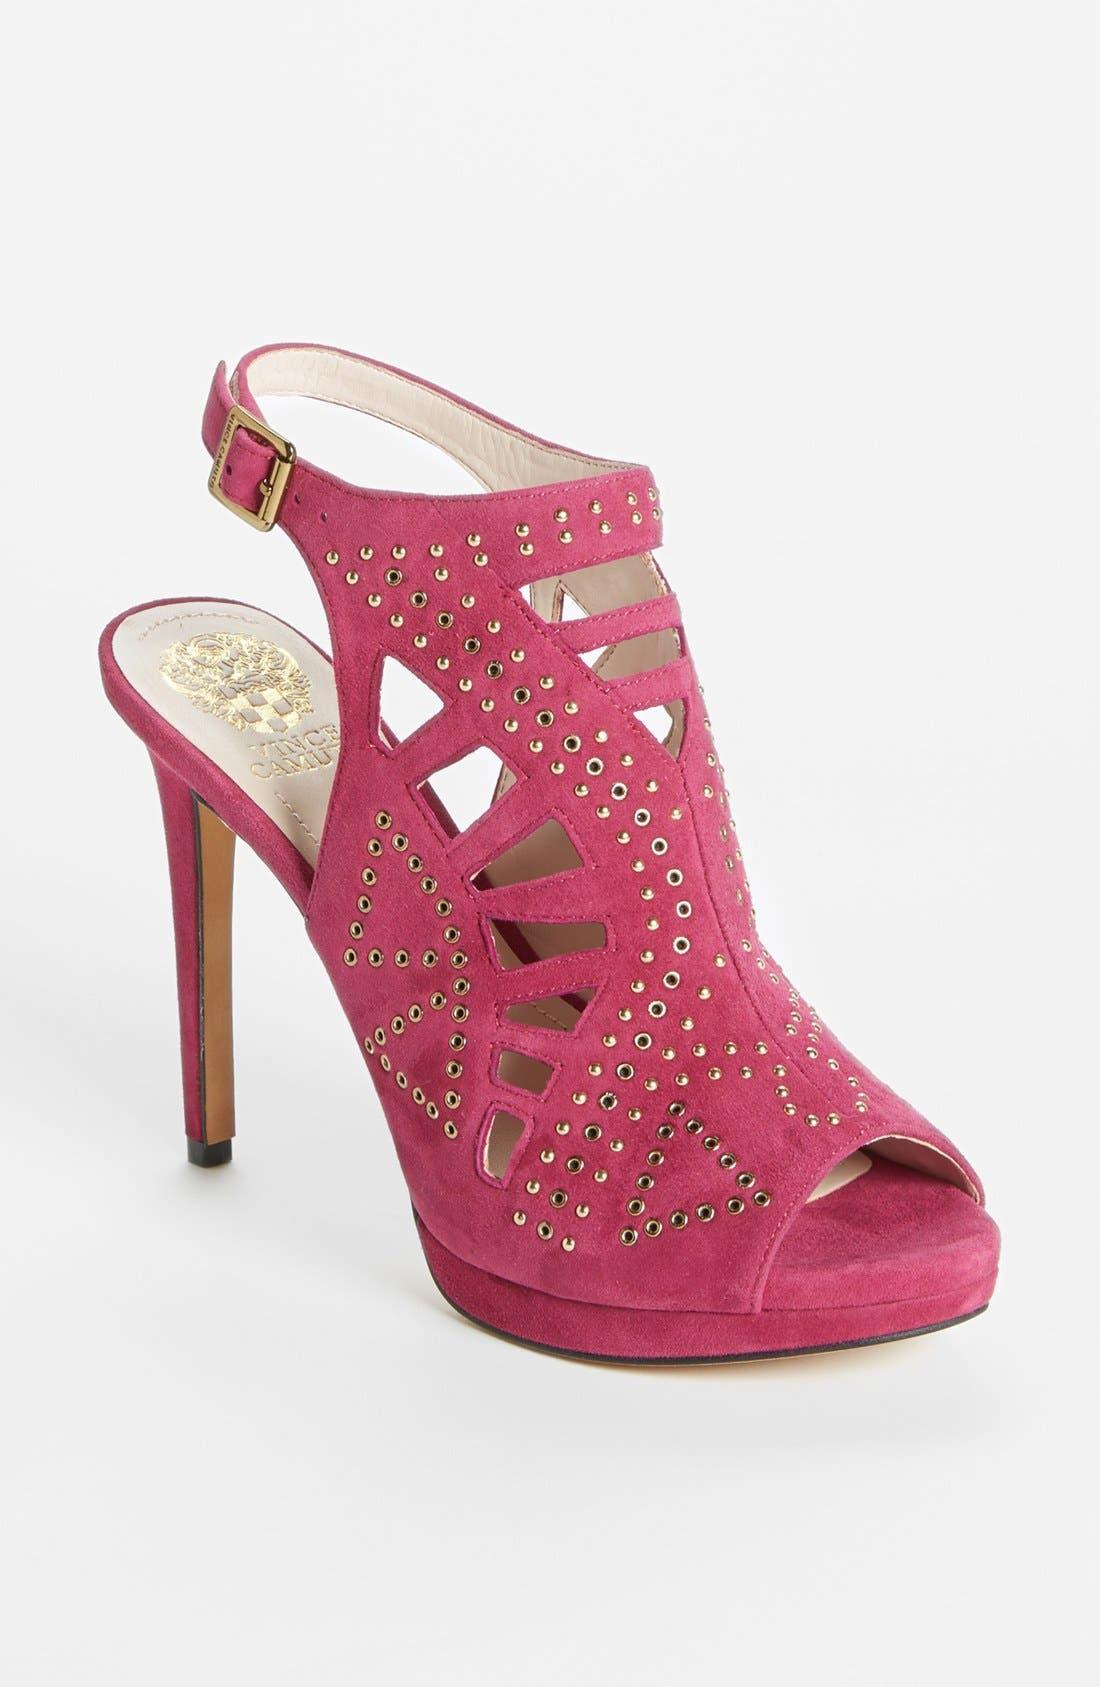 Main Image - Vince Camuto 'Cassi' Sandal